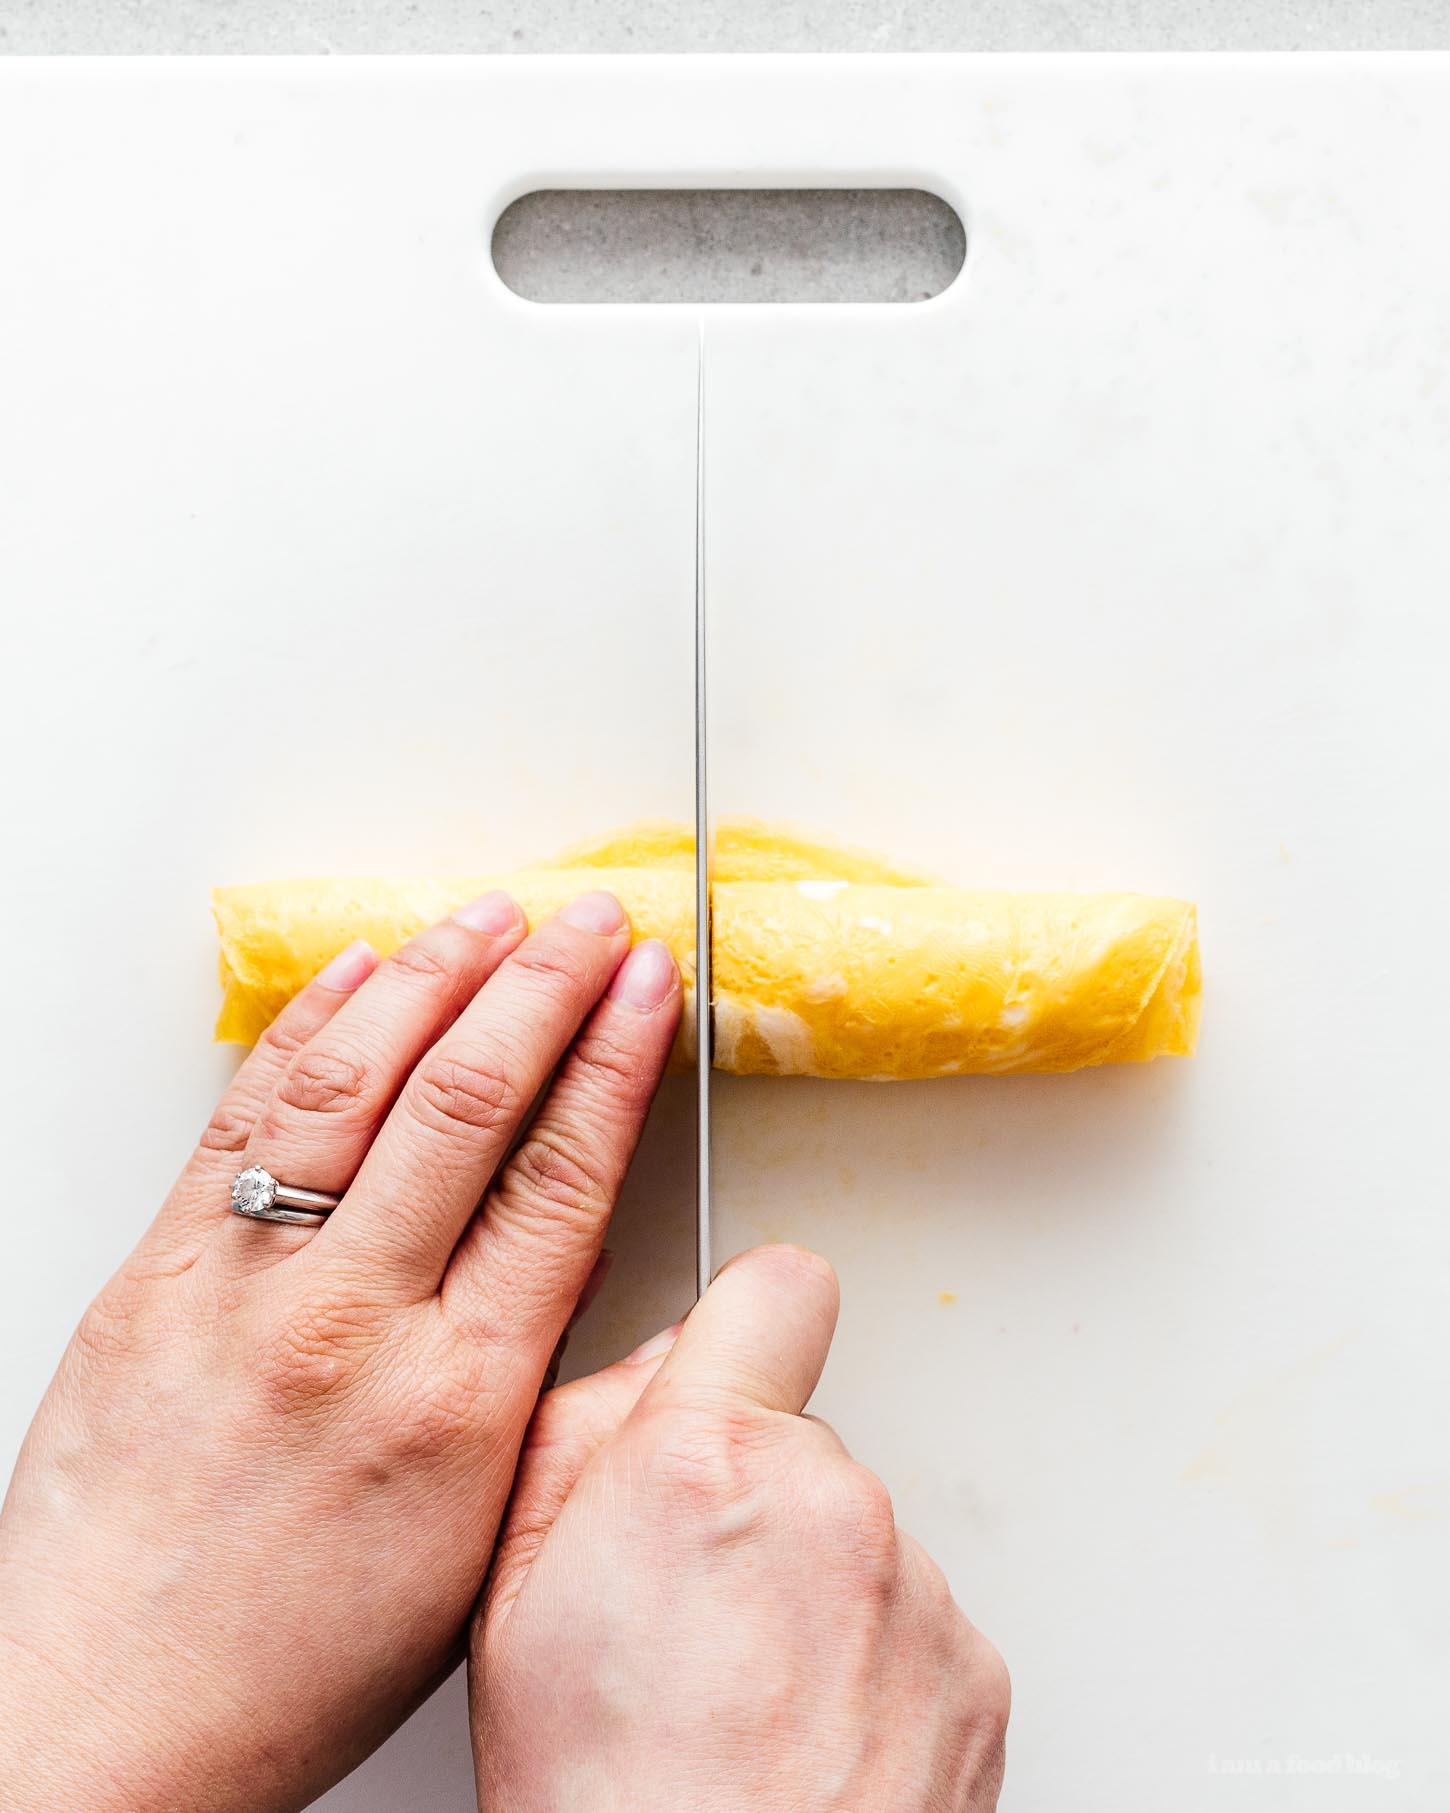 How to Make Egg Ribbons | www.iamafoodblog.com